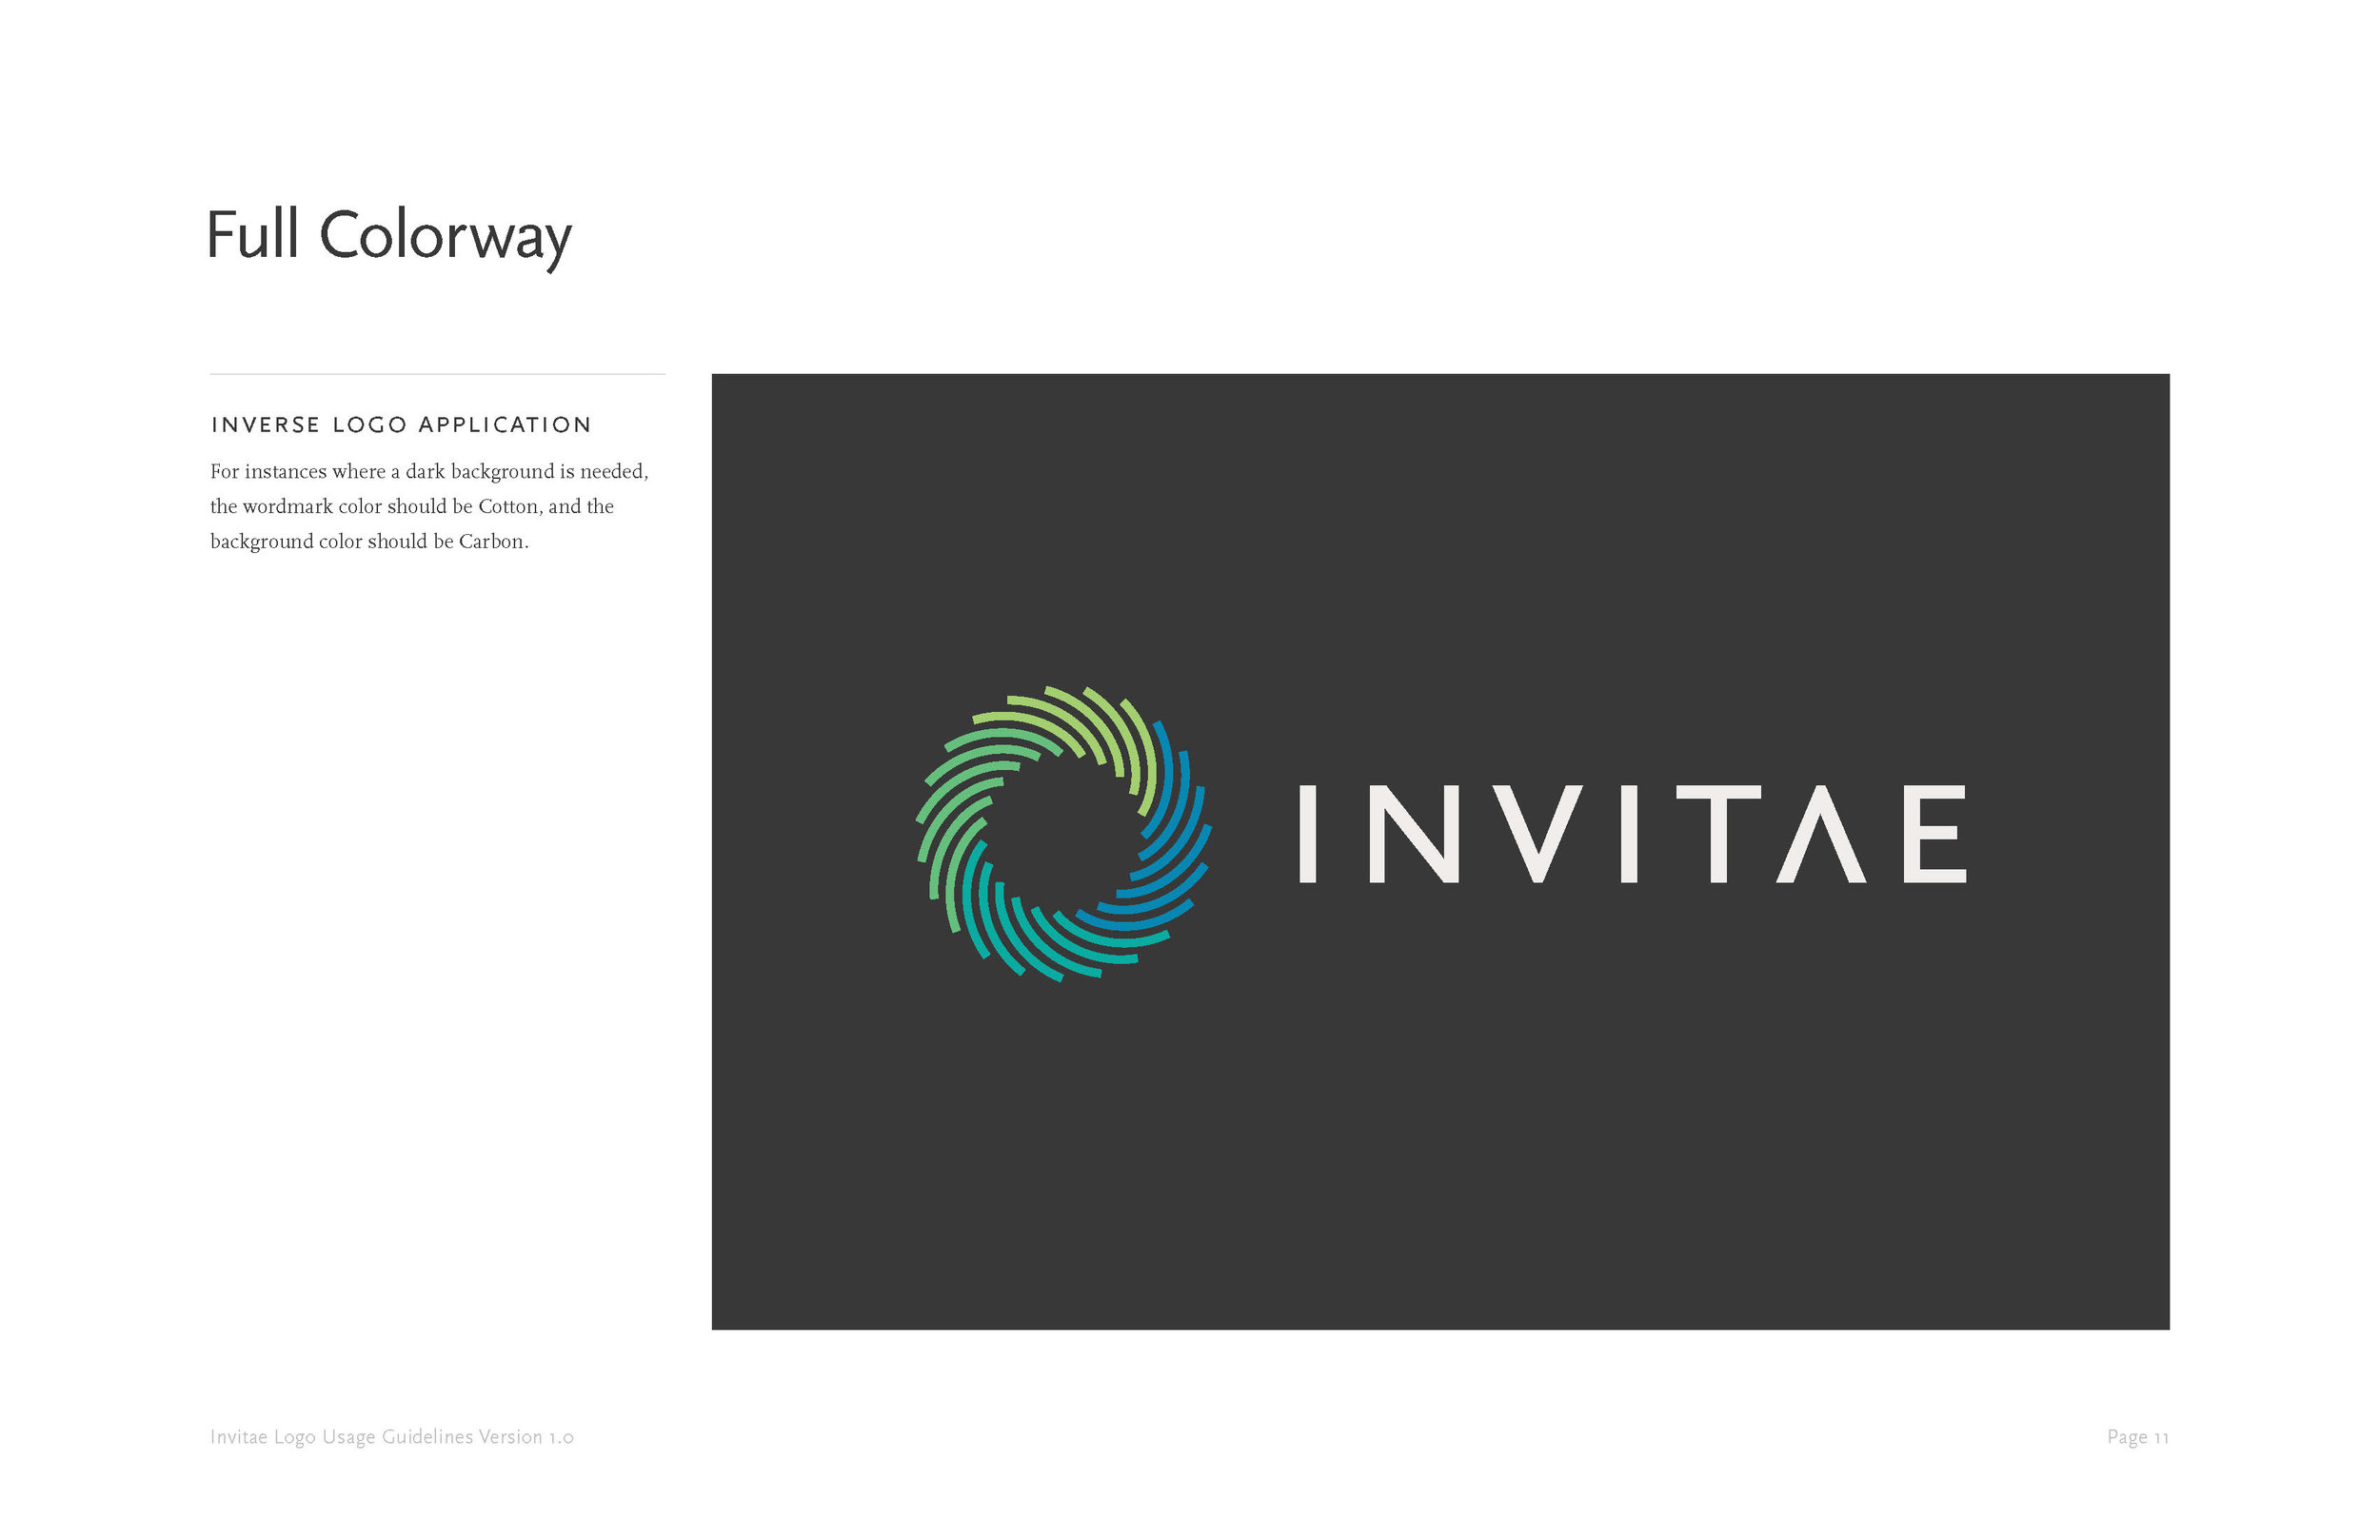 Invitae_logo_guidelines_Page_13.jpg